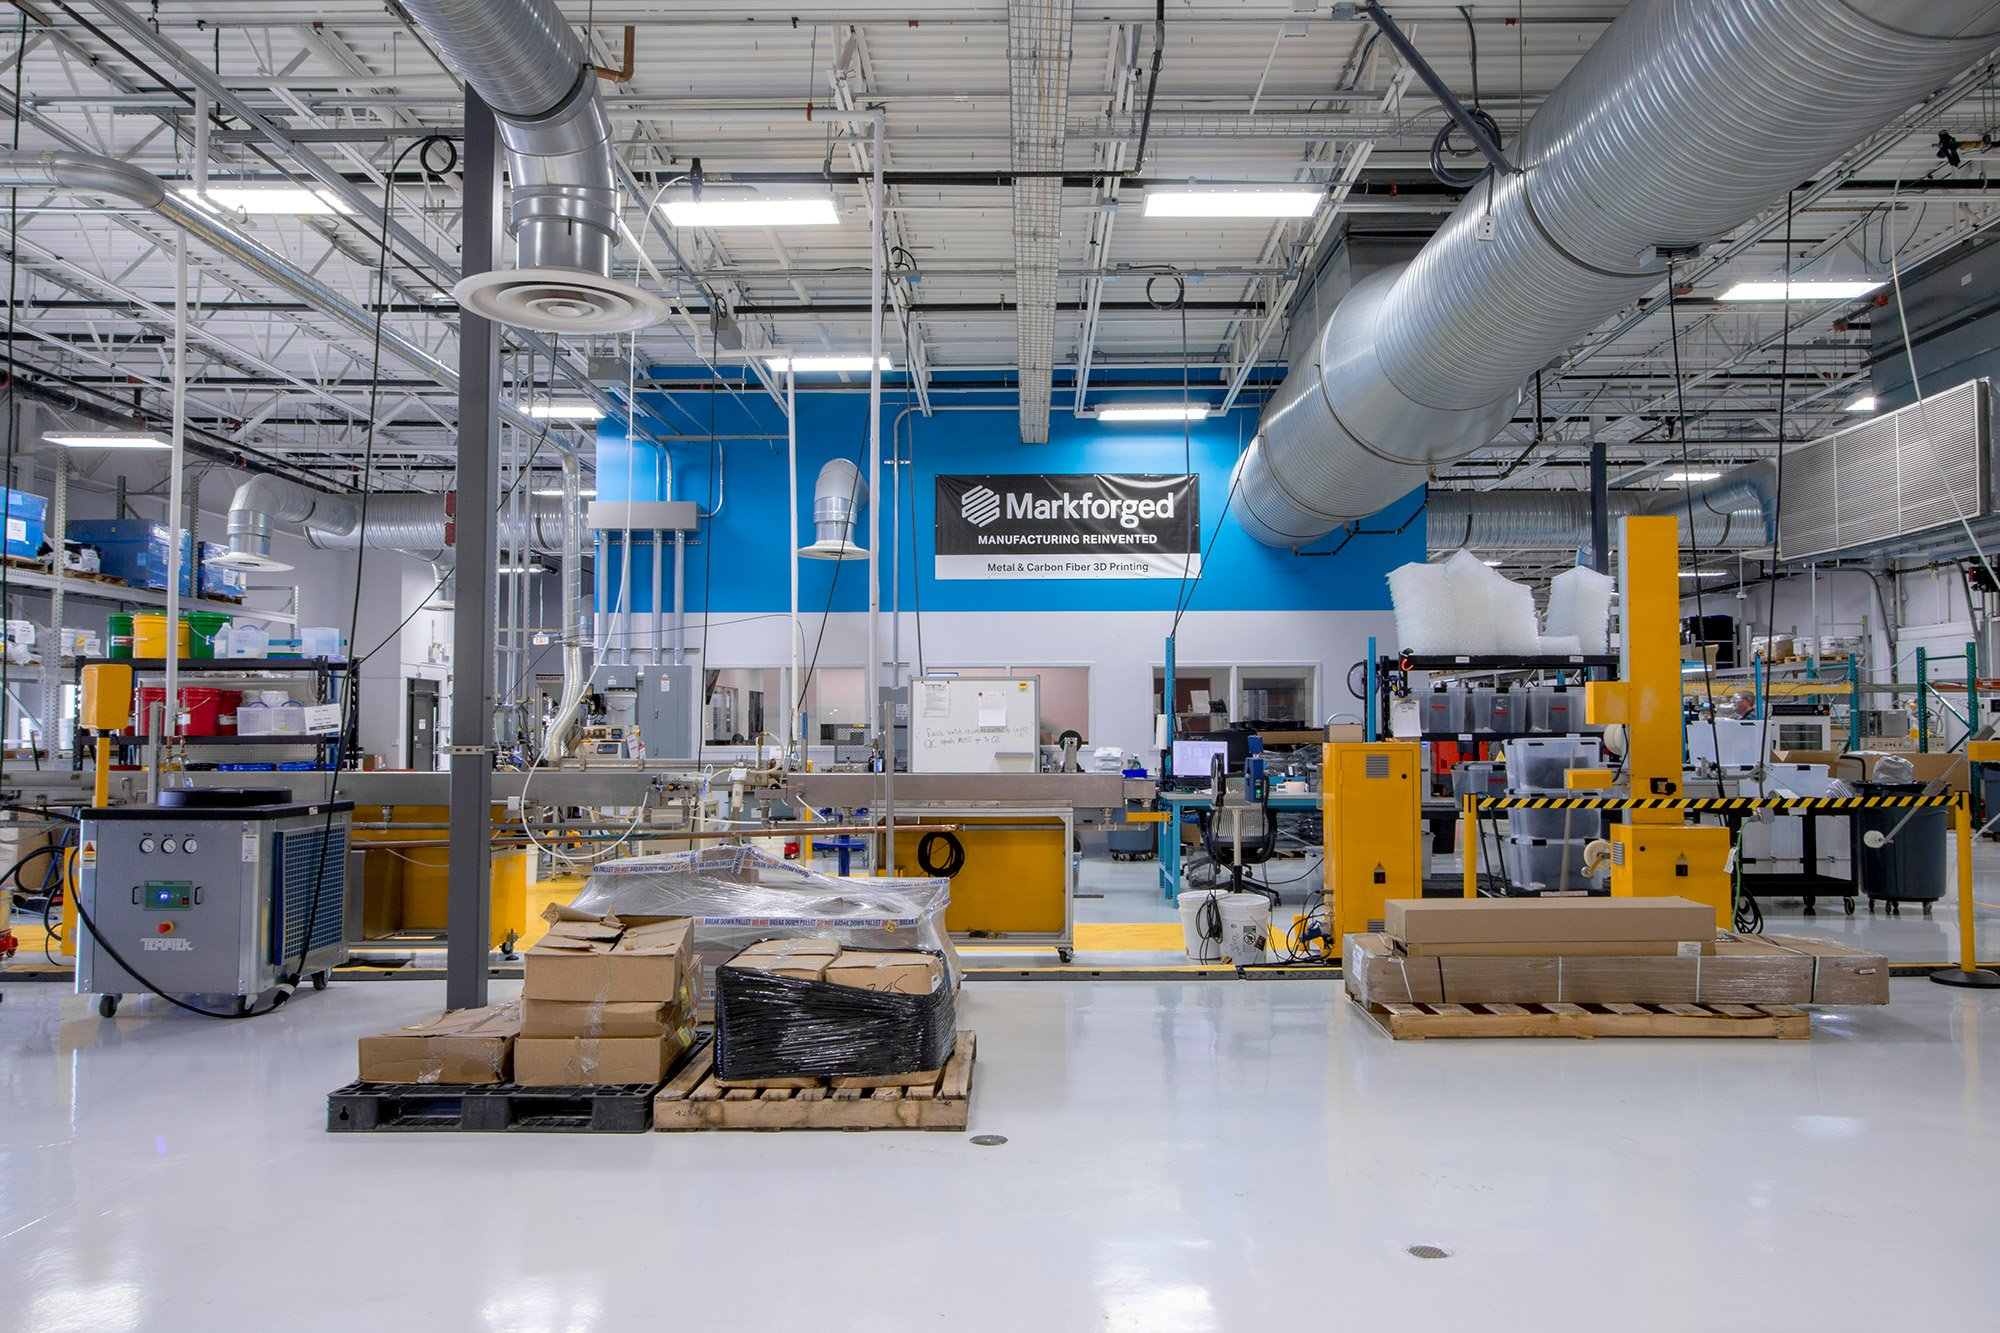 Inside the Billerica, Massachusetts facility. Photo via Markforged.